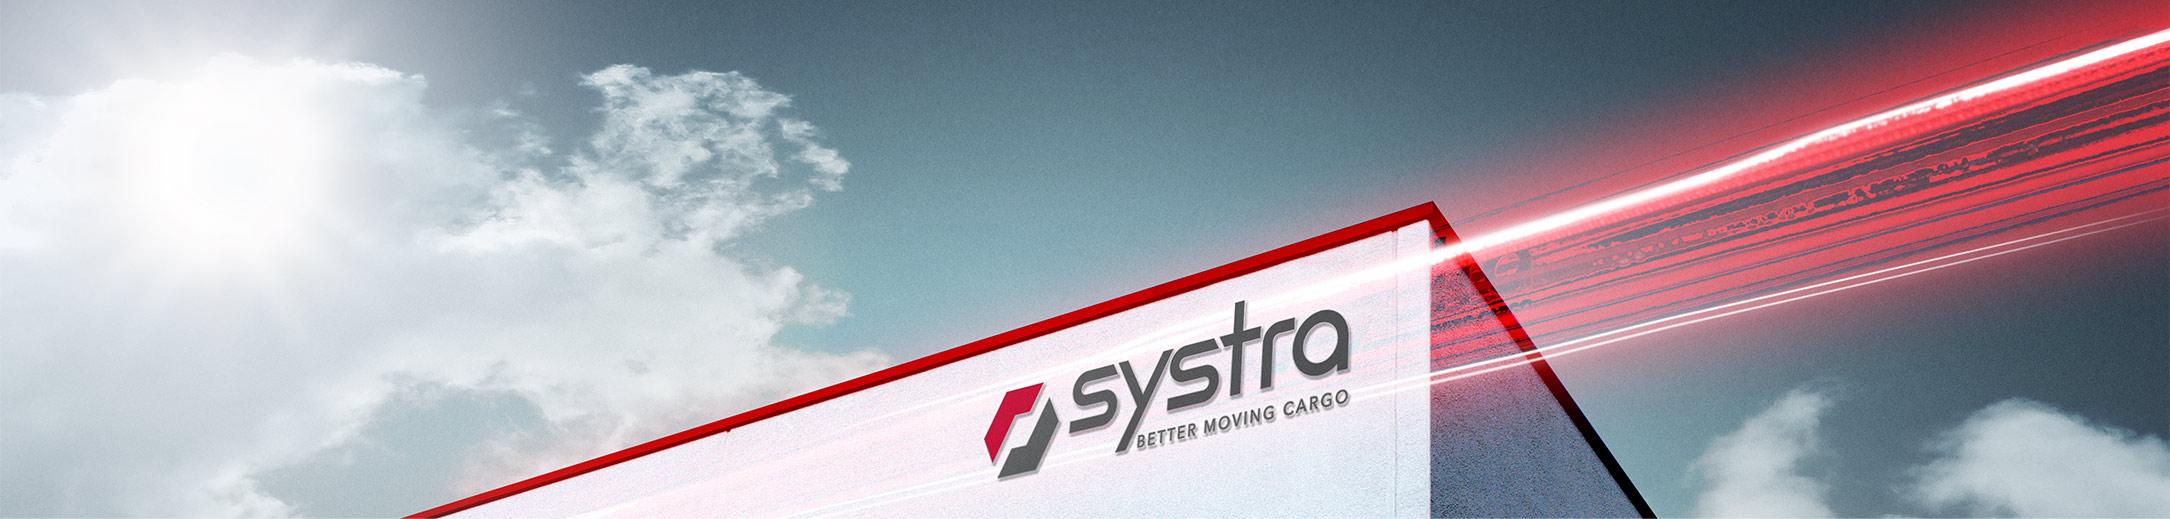 Systra Logistik - Lagerlogistik